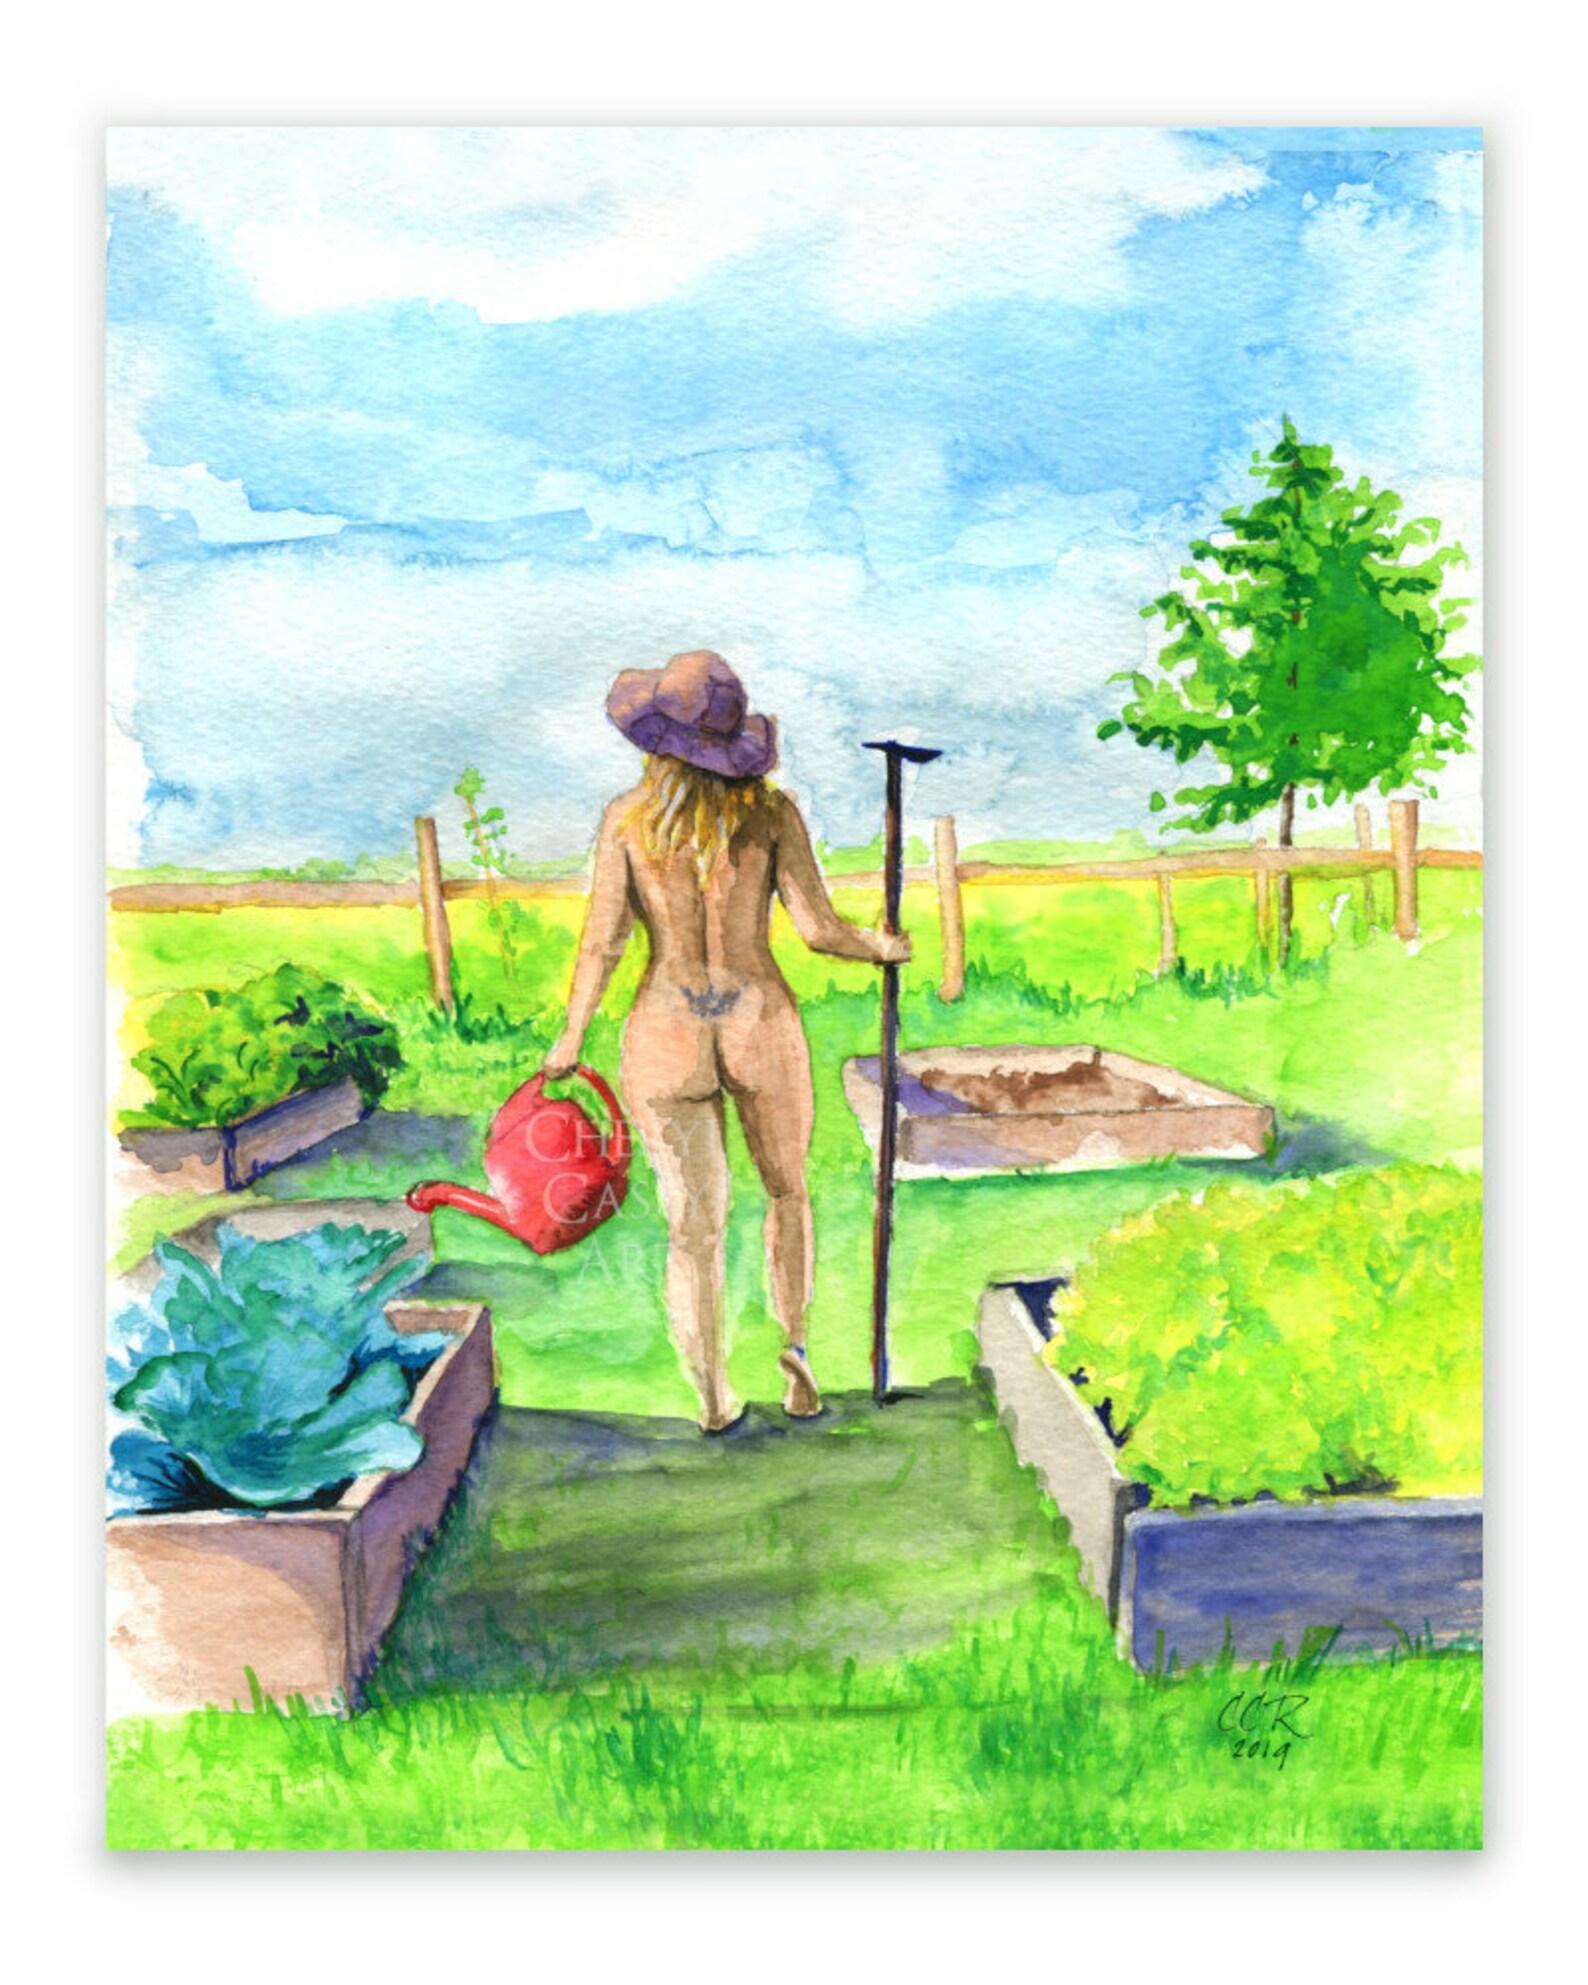 Campbelltown's tim's garden centre owner tim pickles talks about world naked gardening day